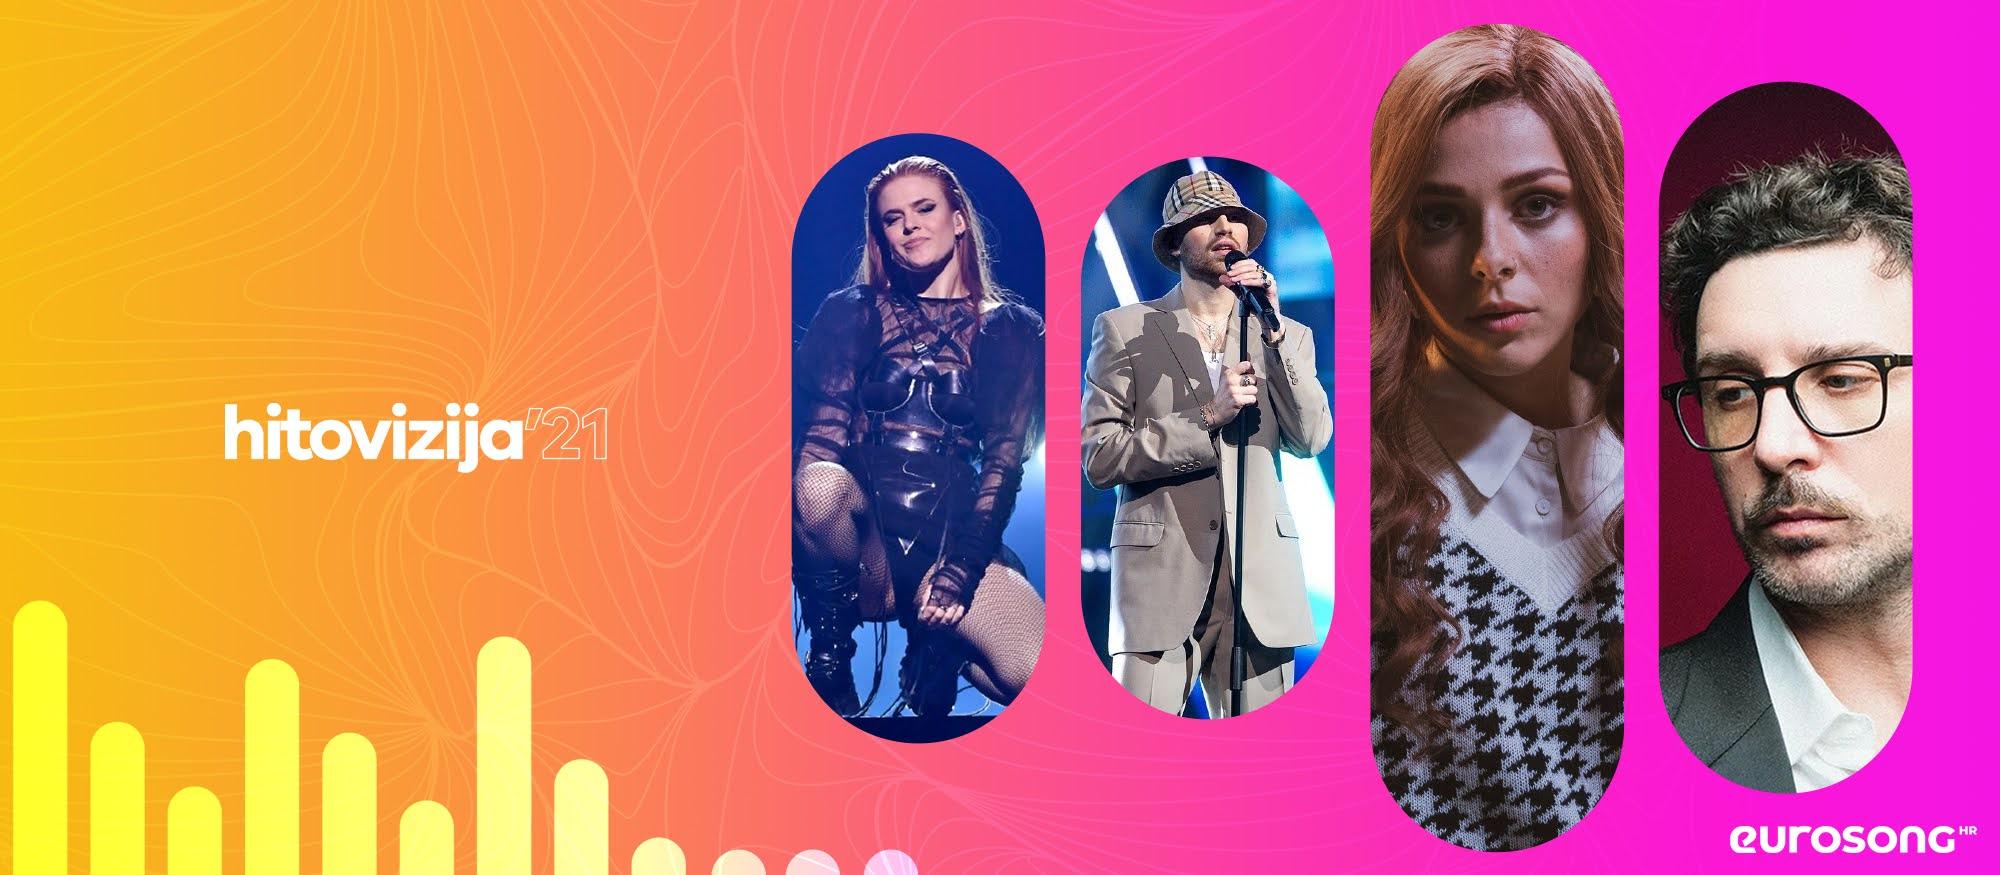 Vizual za projekt Hitovizija, pjesme s nacionalnih izbora za Eurosong, Dotter, Gabrielius Vagelis, Victoria, Willie Peyote